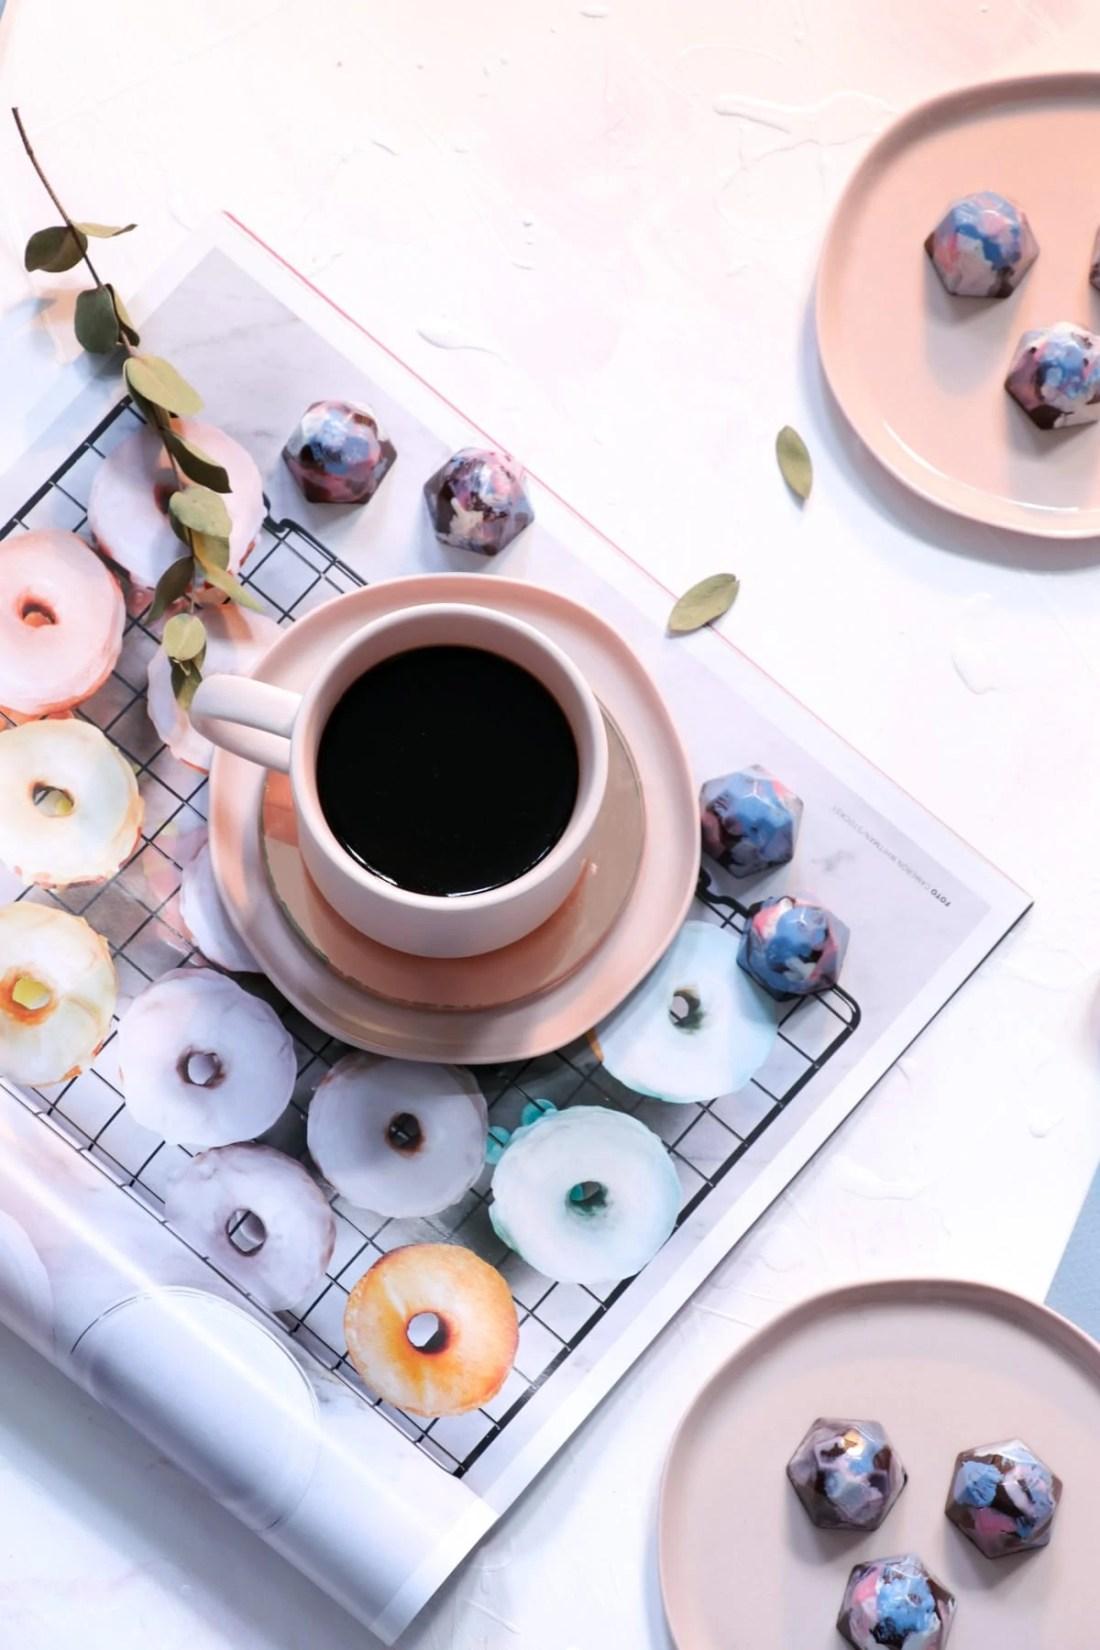 Chocolats maison Vanille-Framboises (Vanilla and Raspberry Homemade Chocolates)